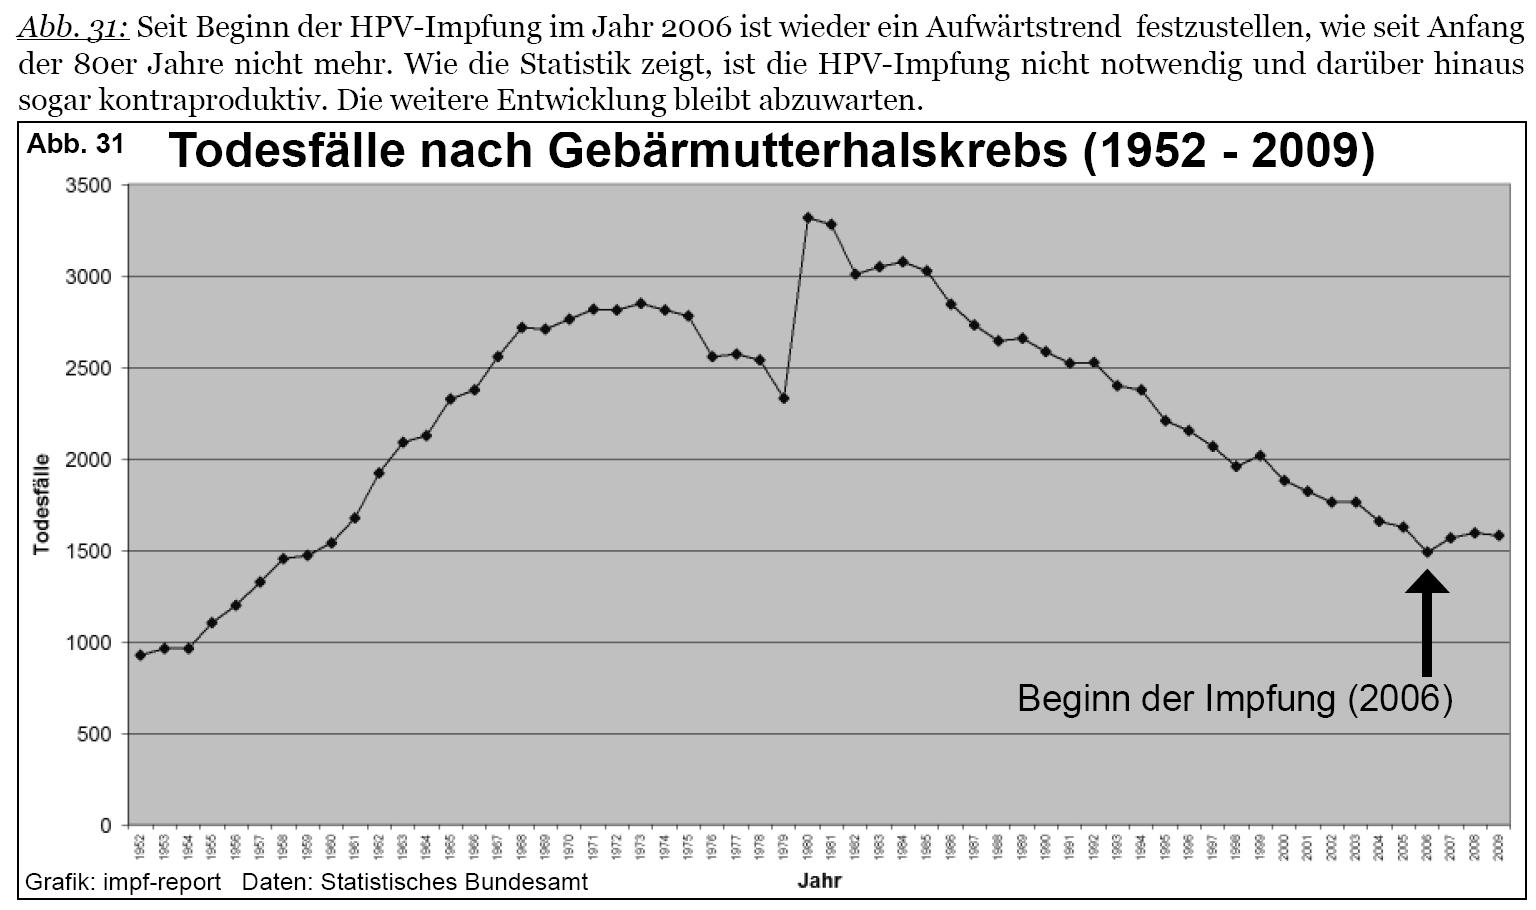 hpv impfung folgen